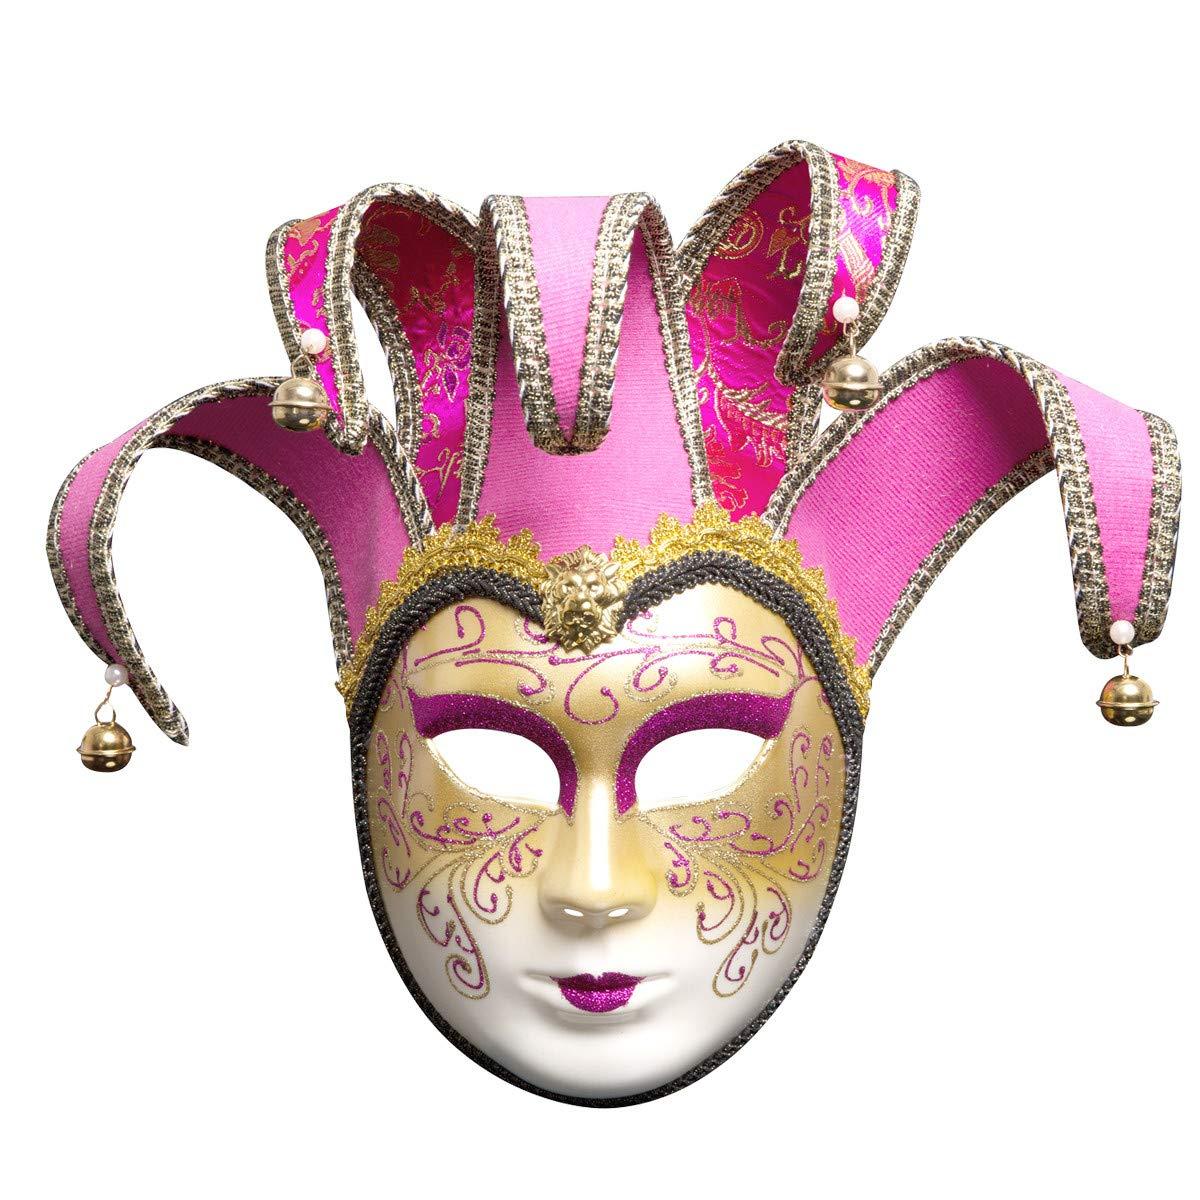 Sonmer Full Face Venetian Joker Masquerade Theater Mask, Mardi Gras Party Ball Mask (Rose Red)